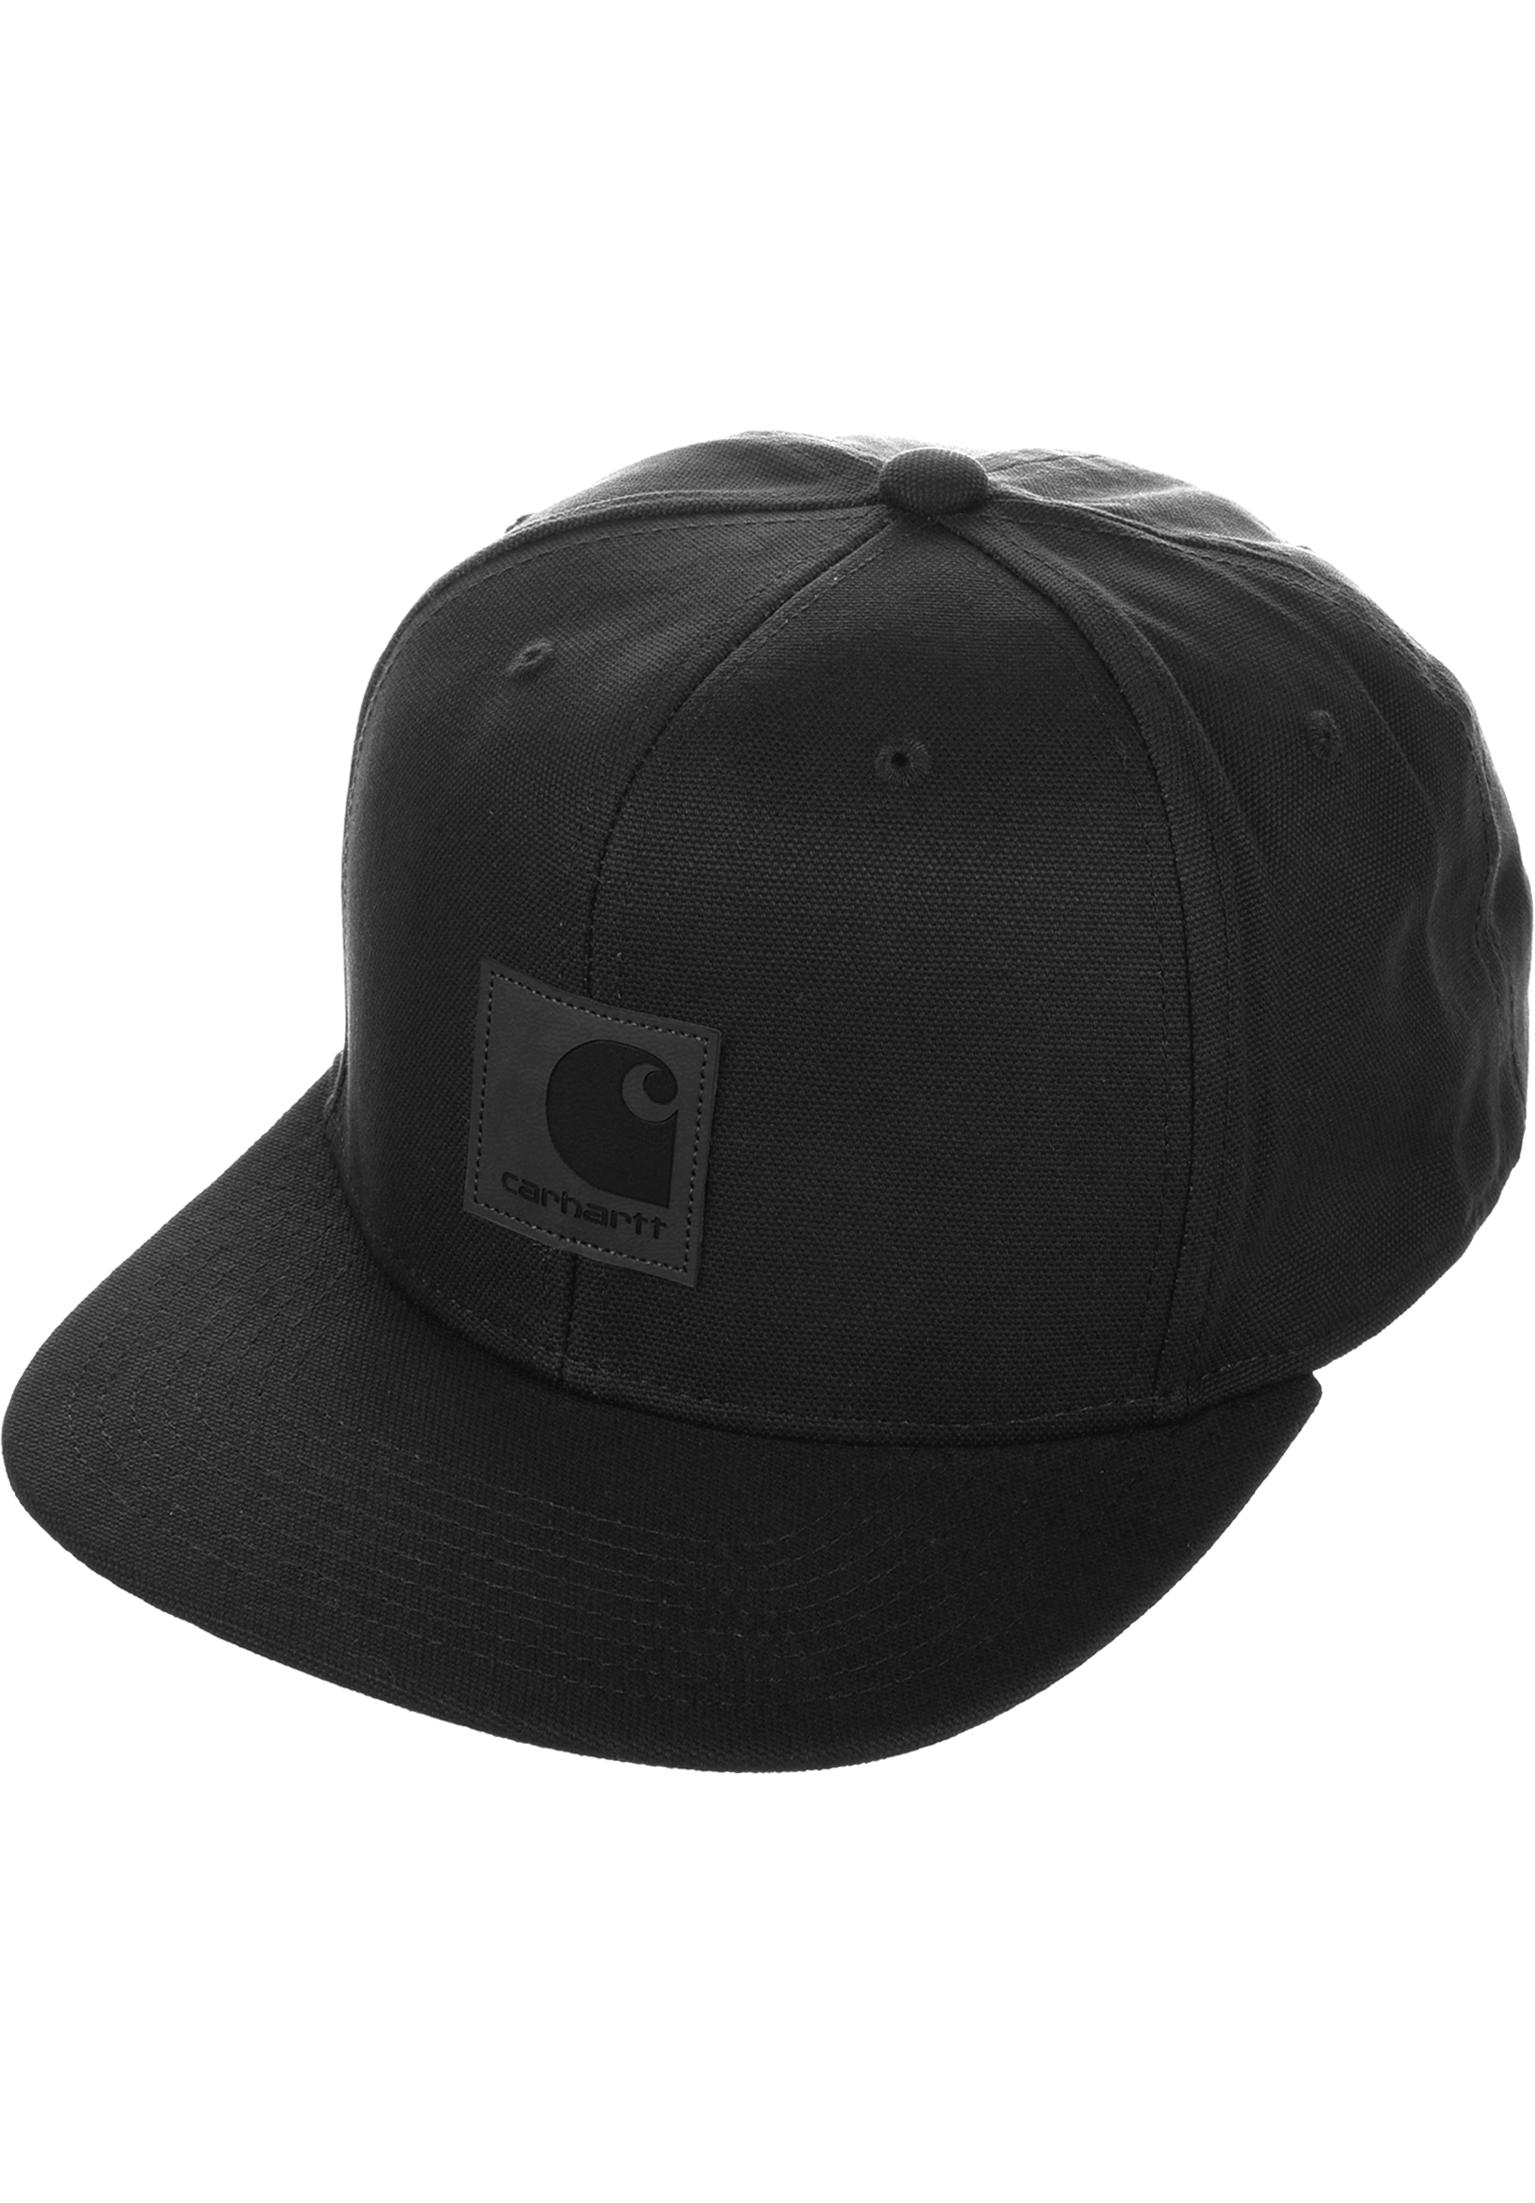 95739502326 Logo Carhartt WIP Caps in black for Men